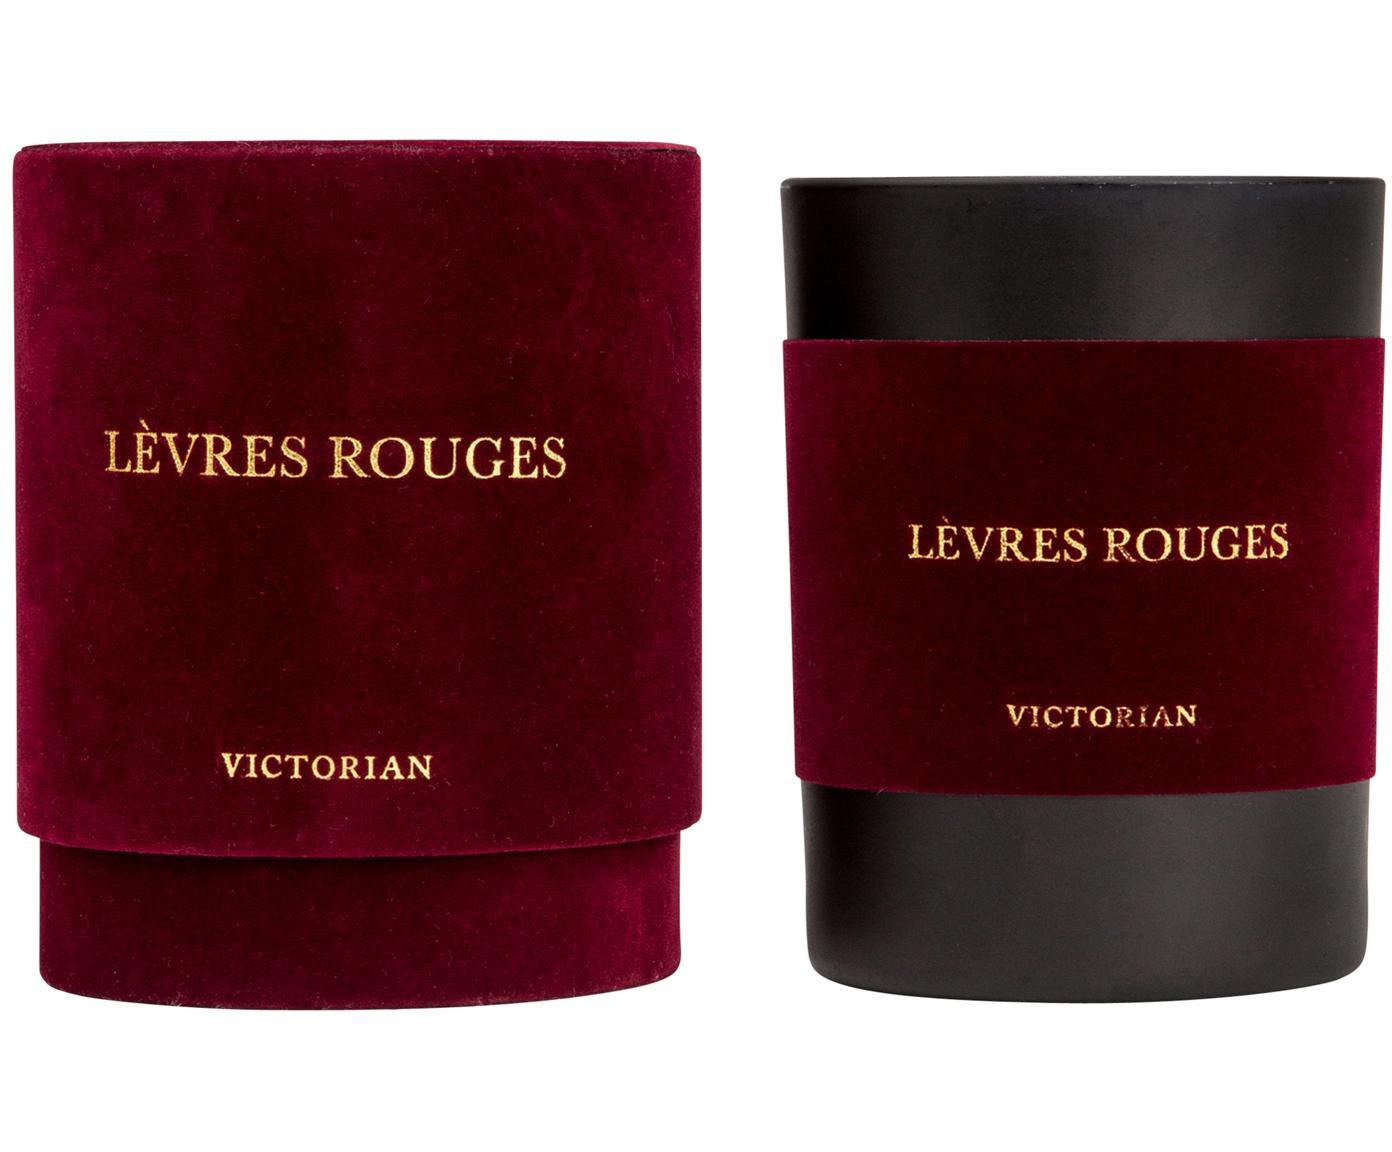 Duftkerze Levres Rouges (Moschus & Vanille), Behälter: Glas, beflockt, Schwarz, Rot, Ø 8 x H 10 cm